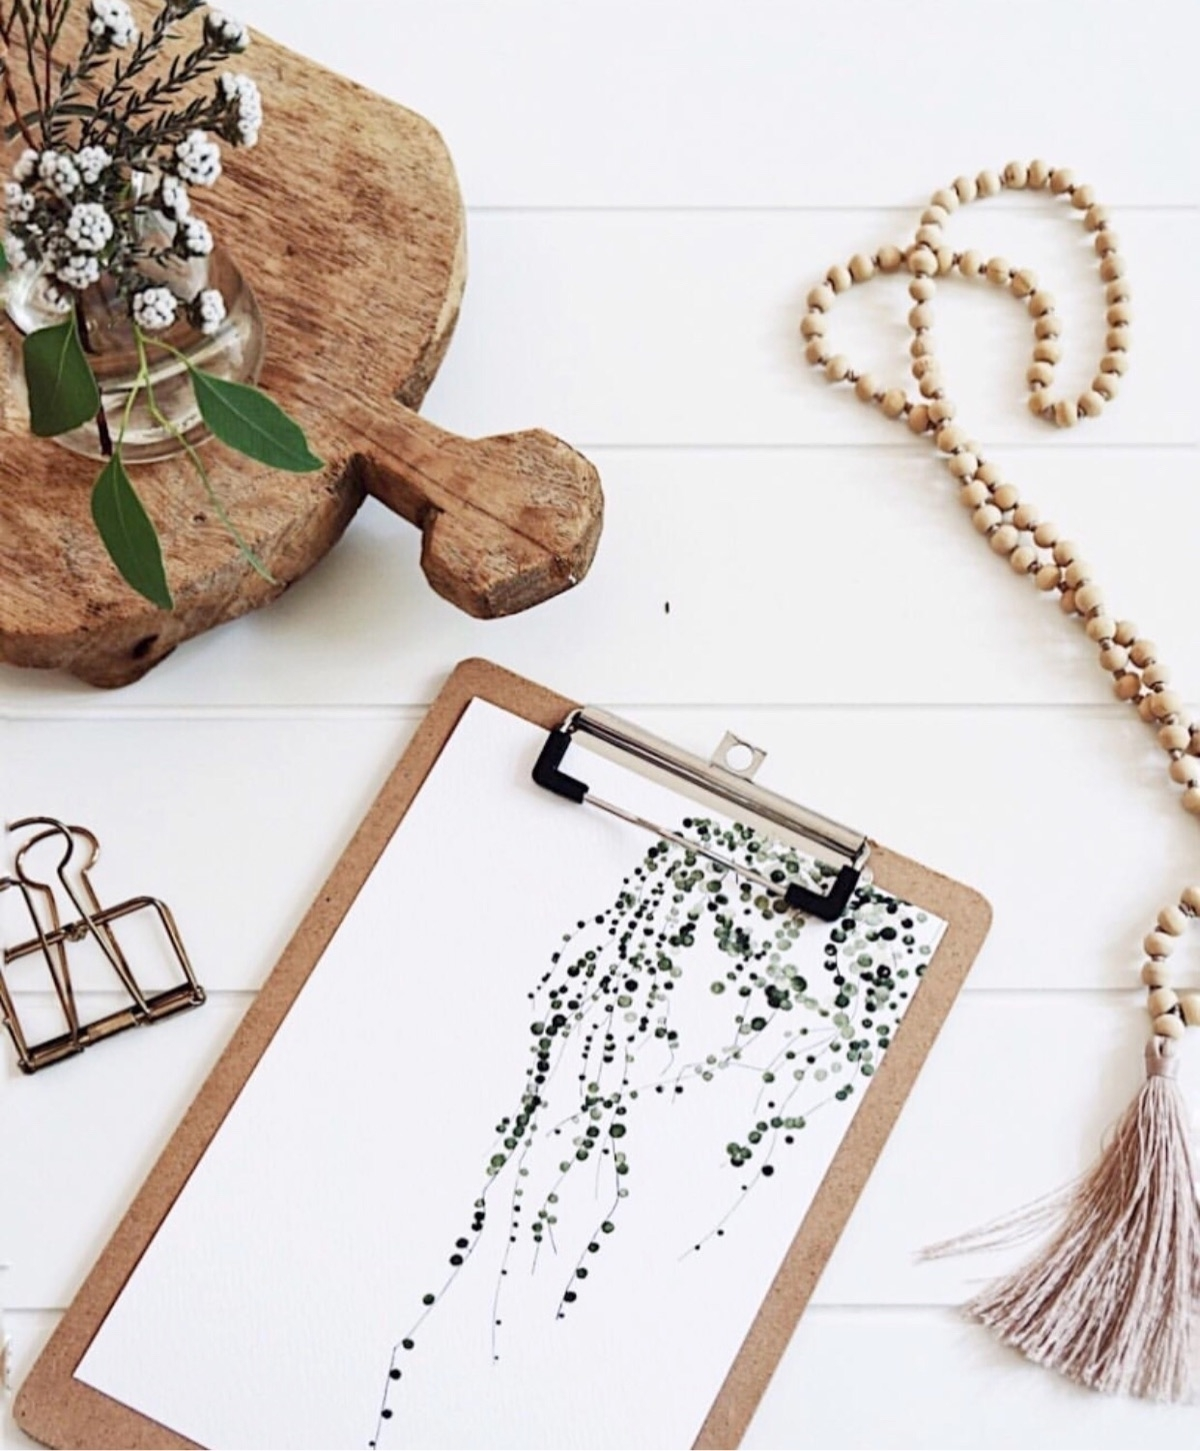 stunning artworks introduce  - aushandmade - aushandmade | ello